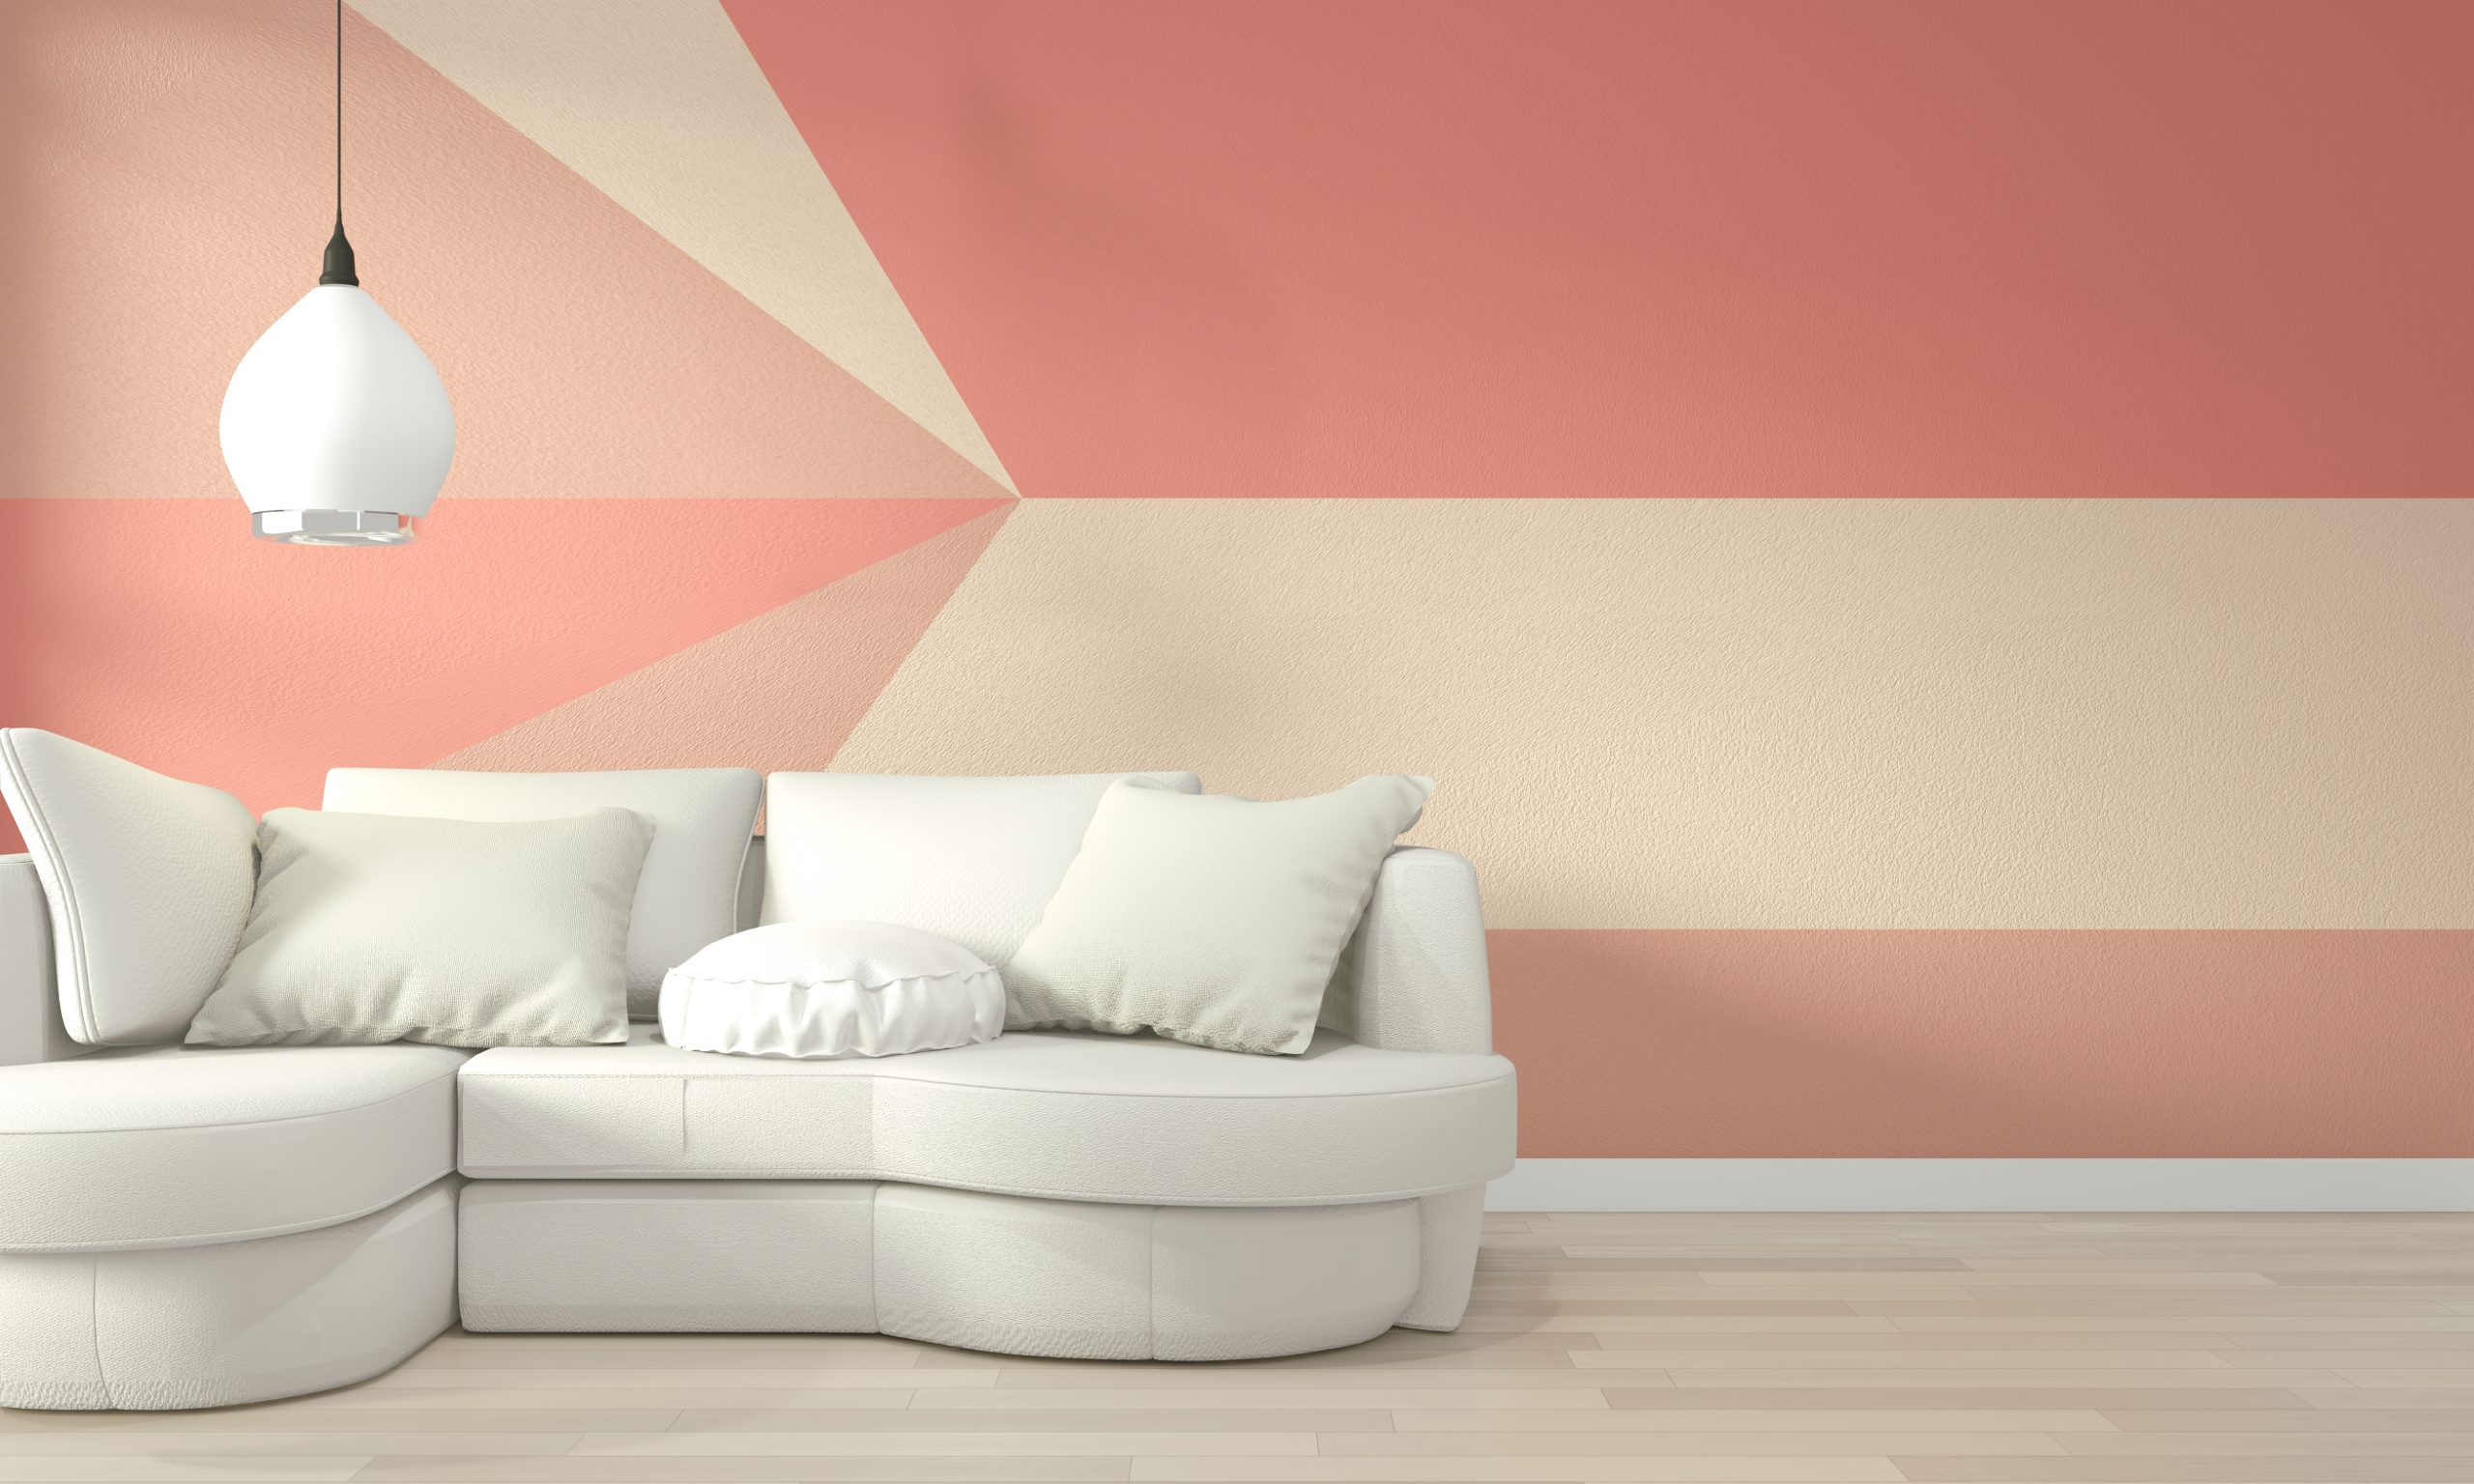 How to Create Unique Paint Colour Schemes for Your Home